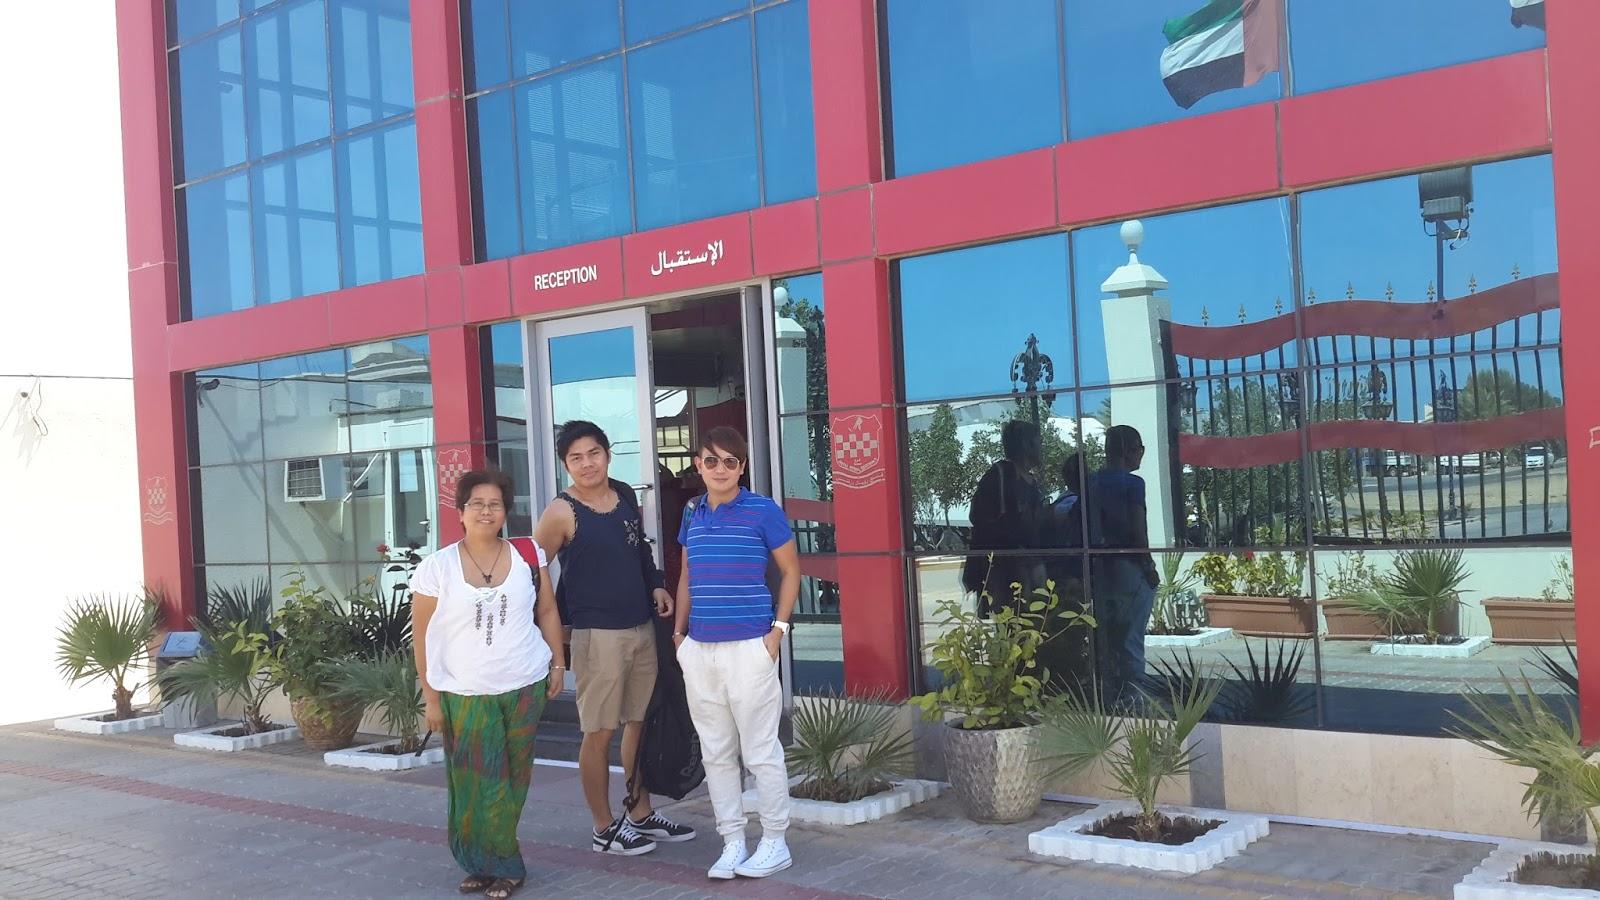 Hotel Royal Residence Im Your Achiano Royal Residence Branch Umm Al Quwain Uae